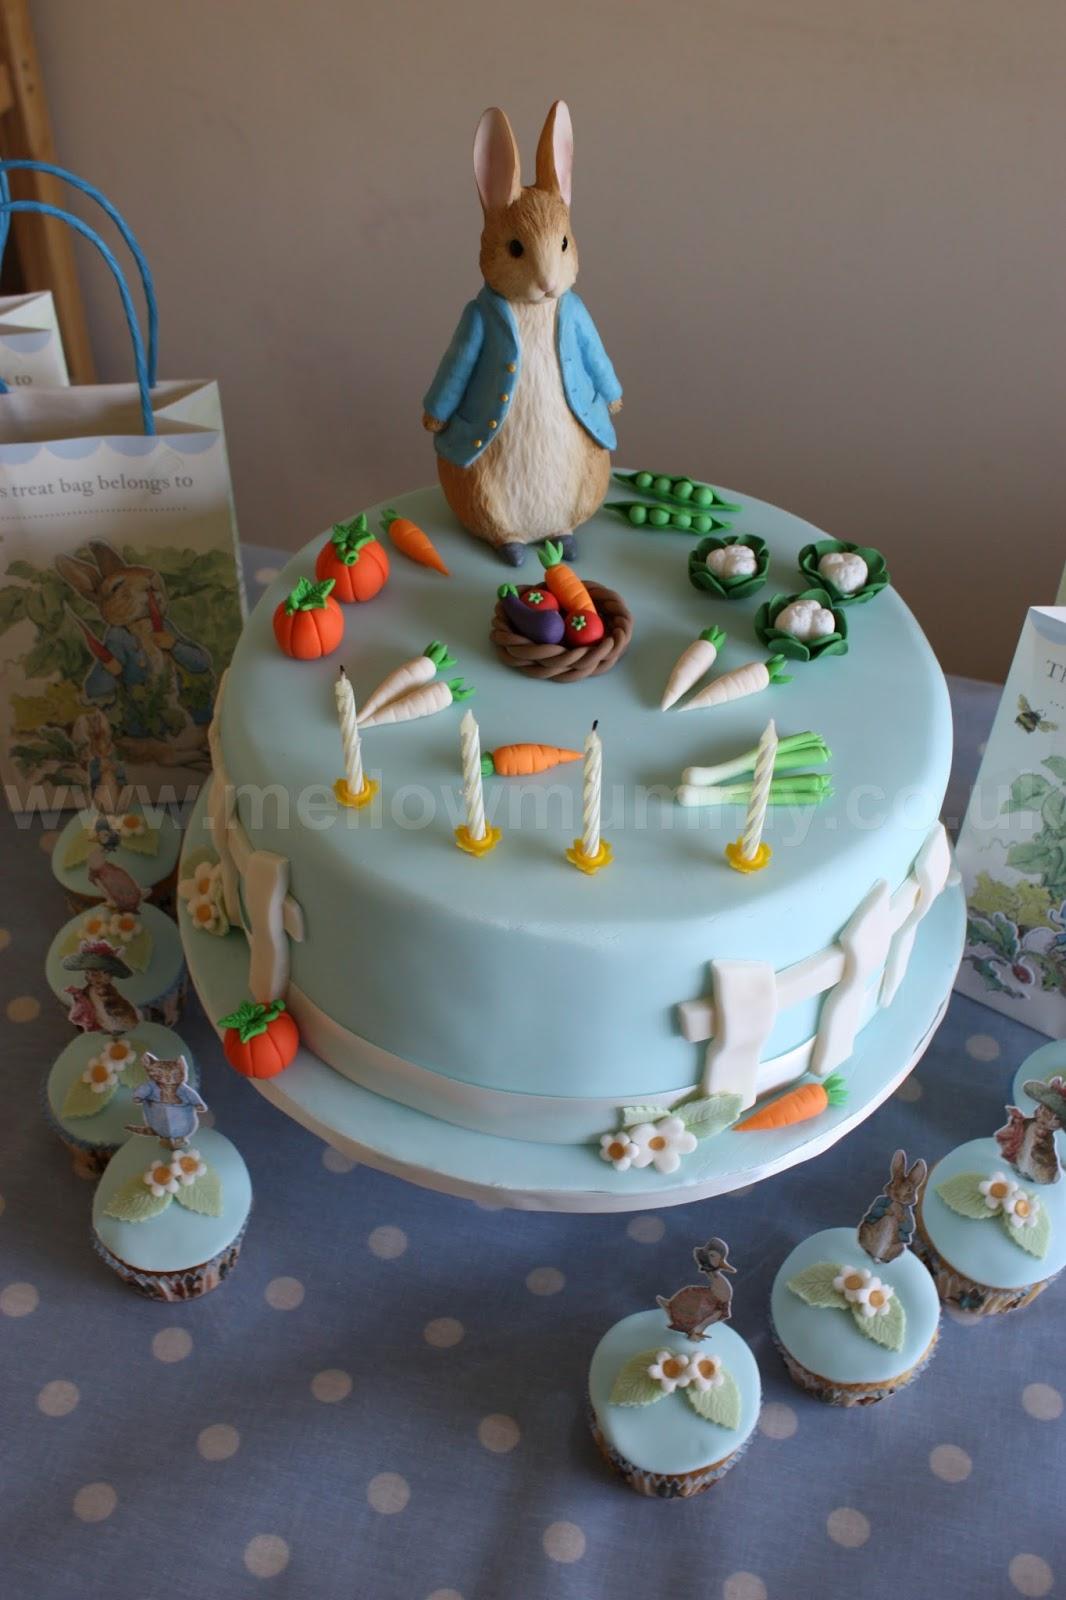 Mellow Mummy The Peter Rabbit Birthday Cake Taking Life